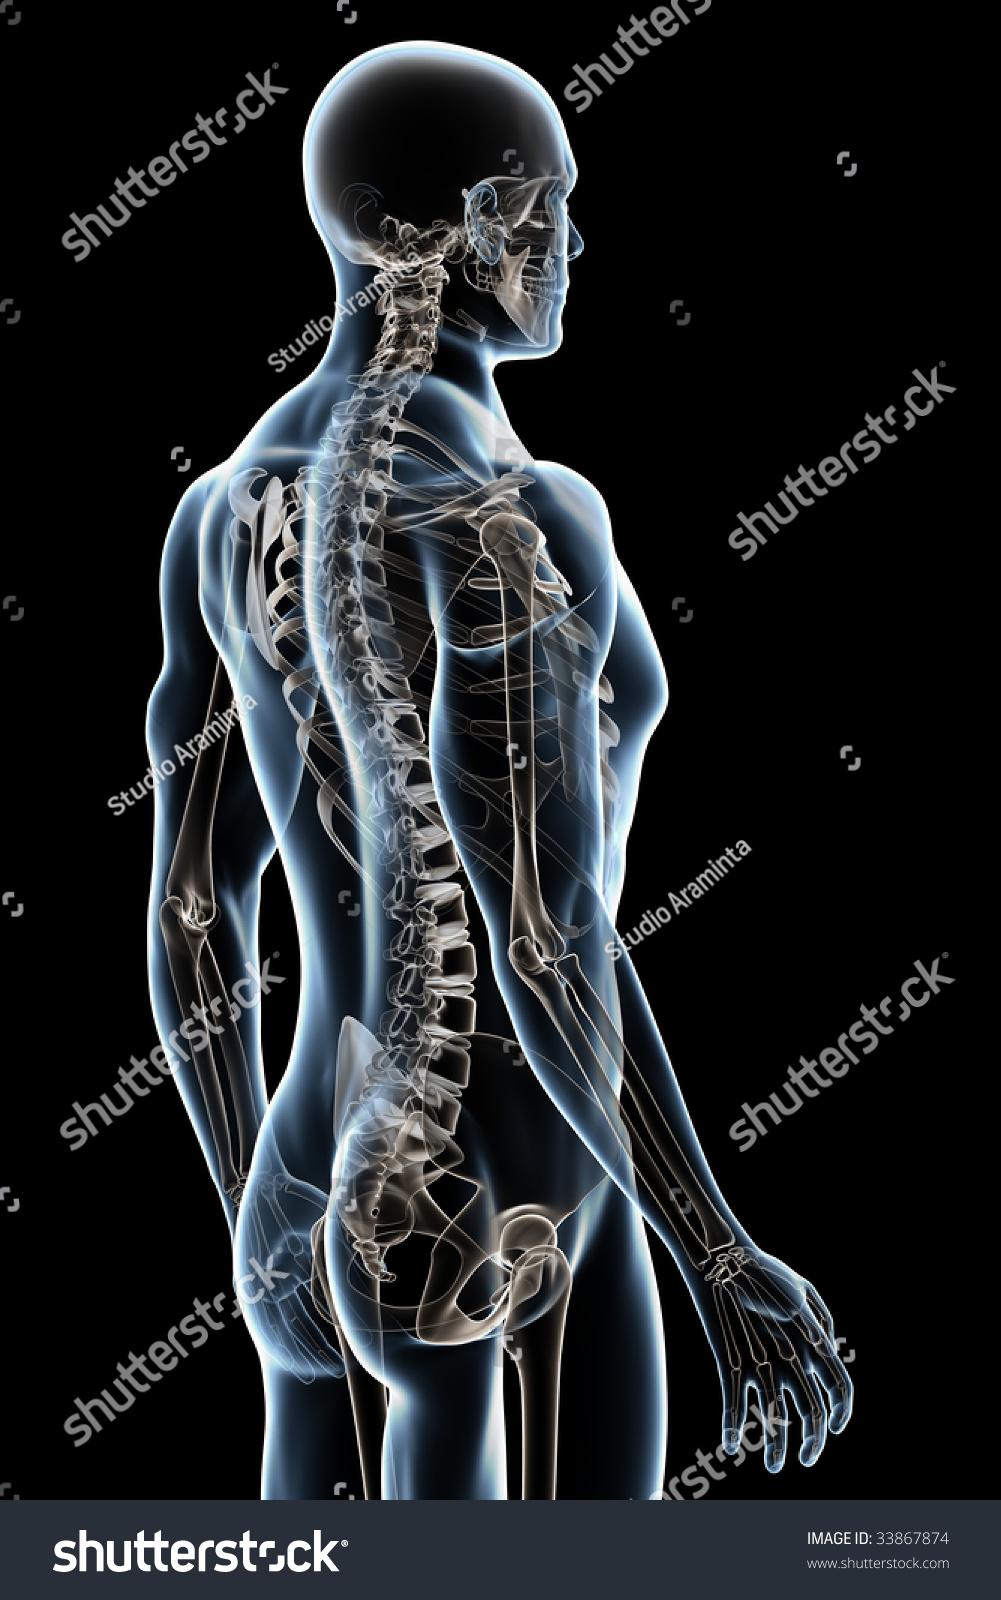 Xray Male Anatomy Over Black Background Stock Illustration 33867874 ...